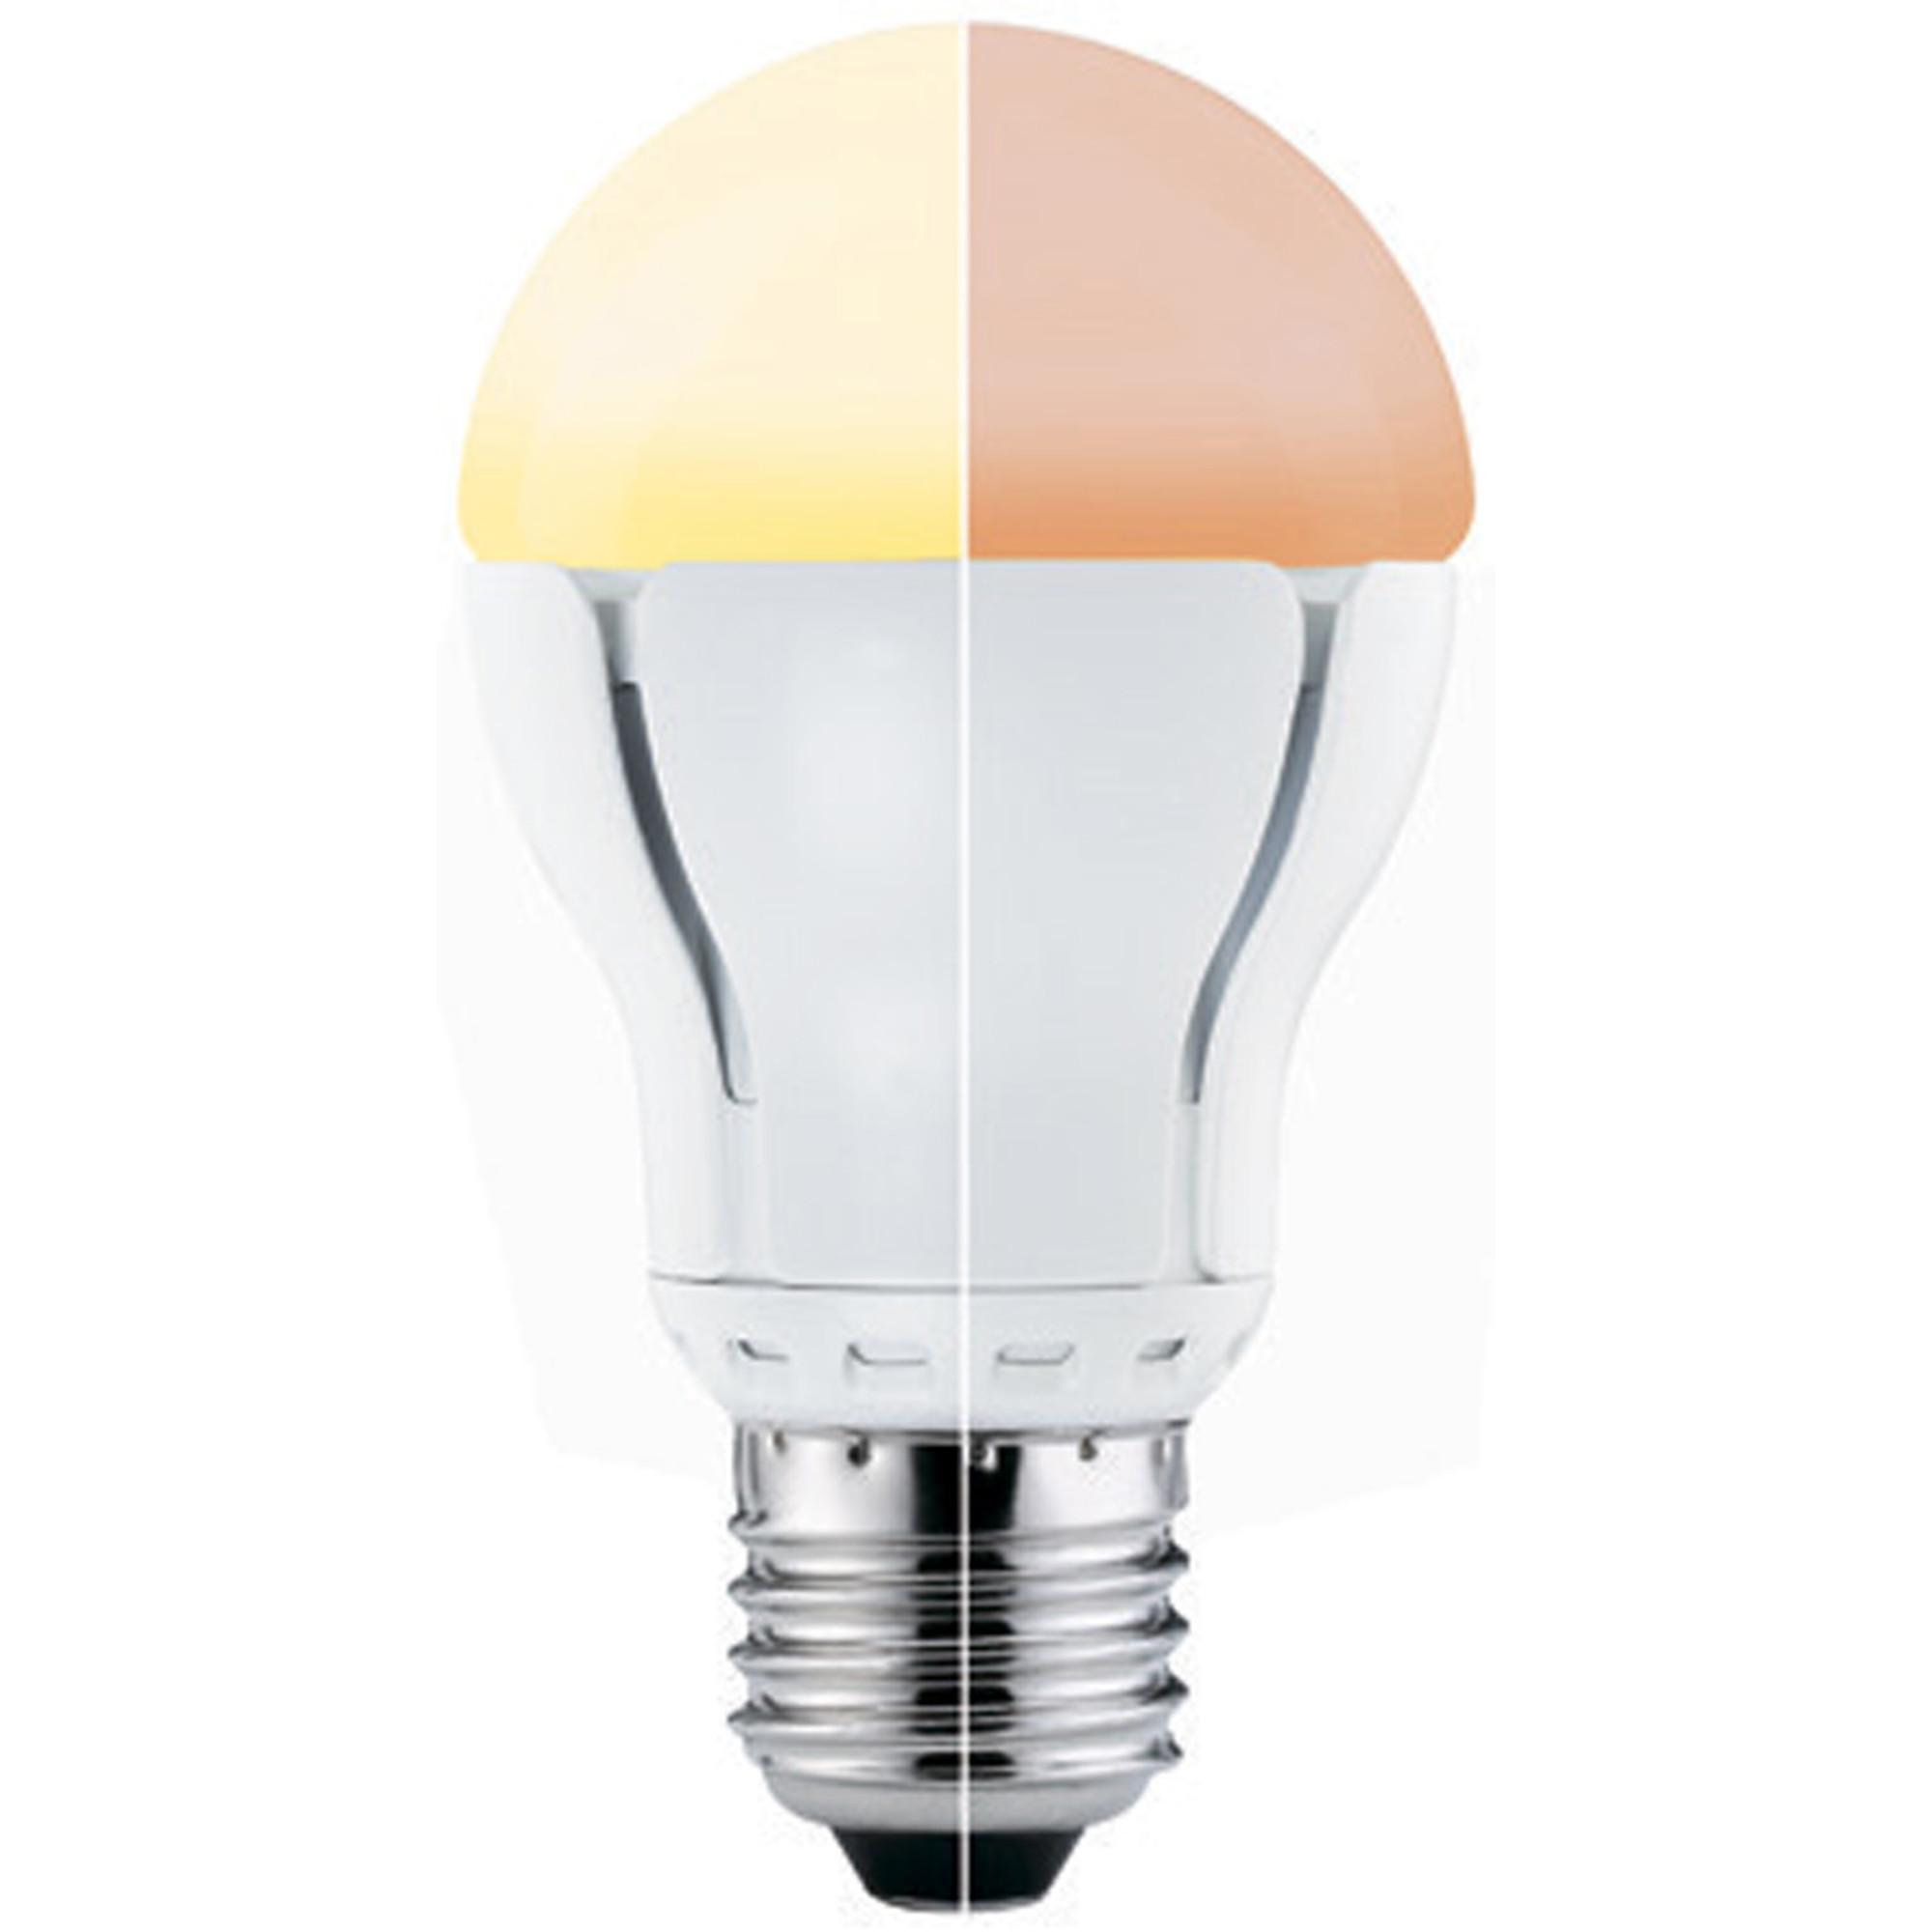 Лампа светодиодная Paulmann 28225 E27 470 Лм теплый свет